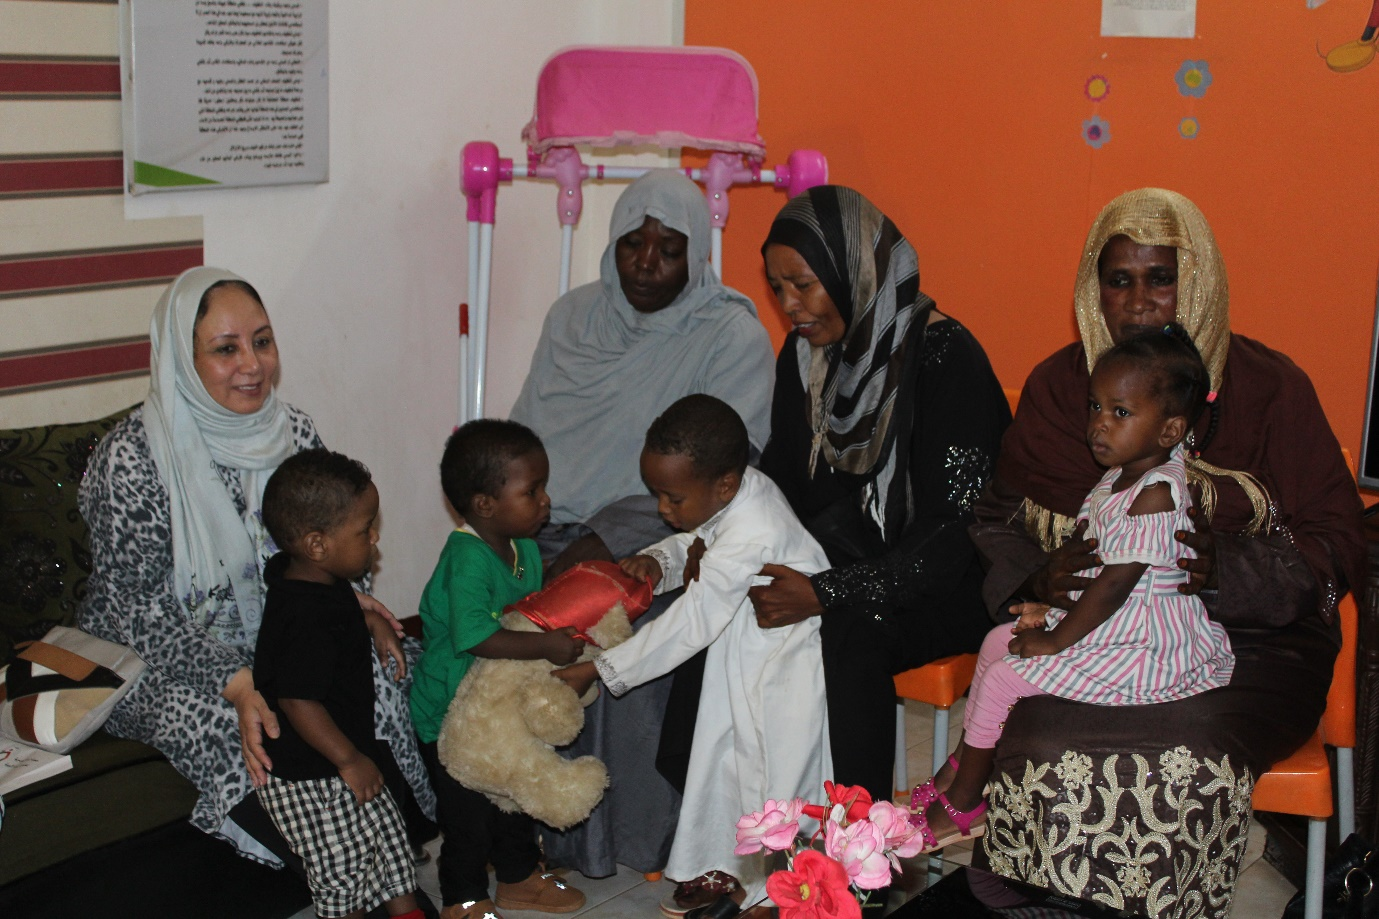 sudan-event10